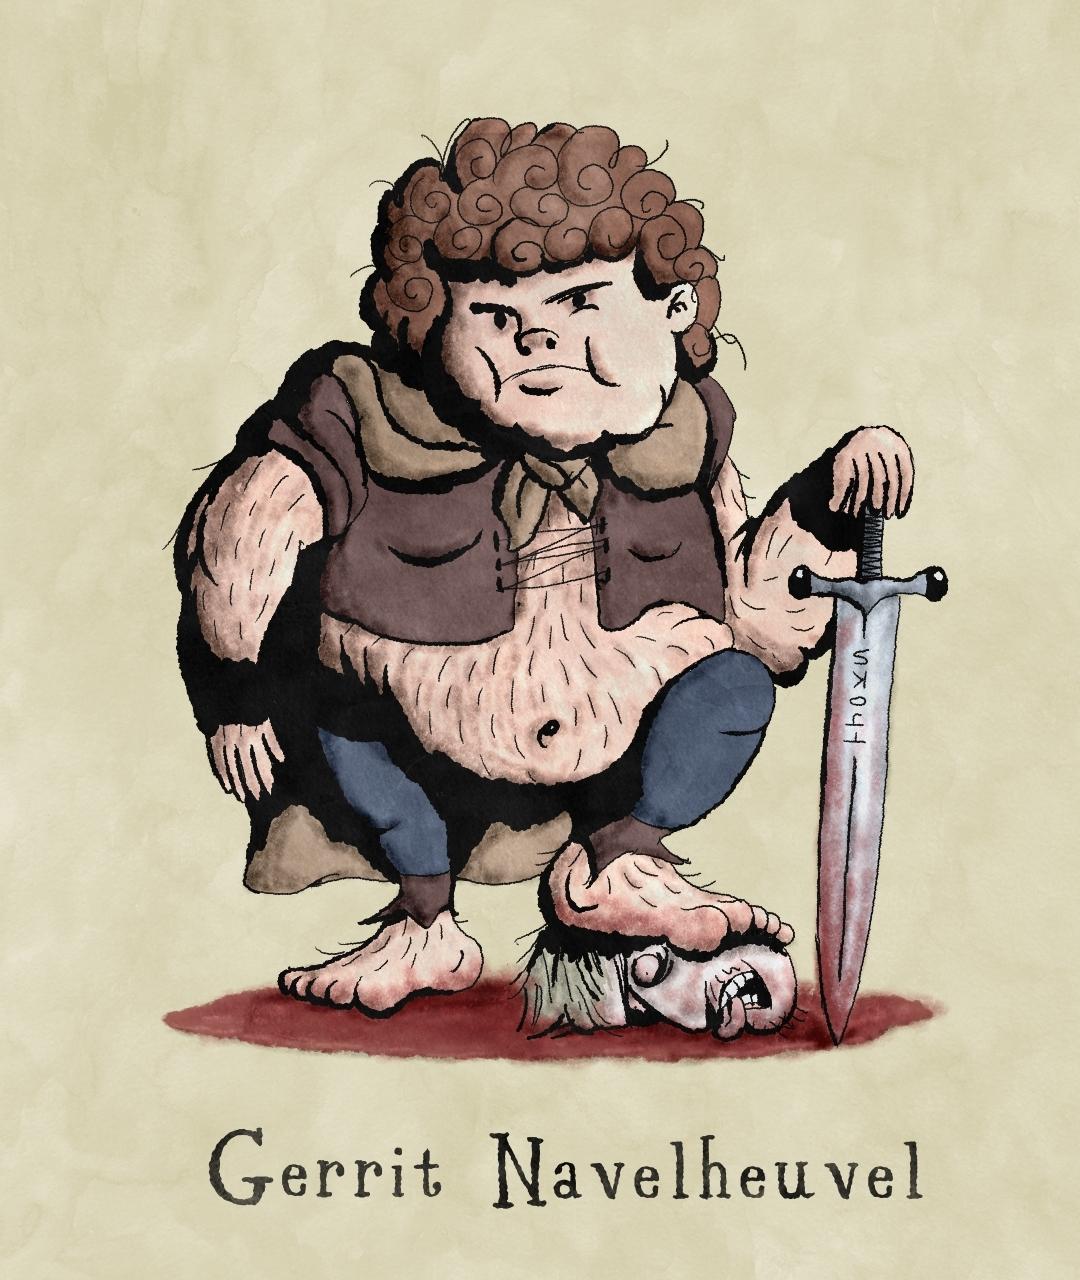 Gerrit Navelheuvel